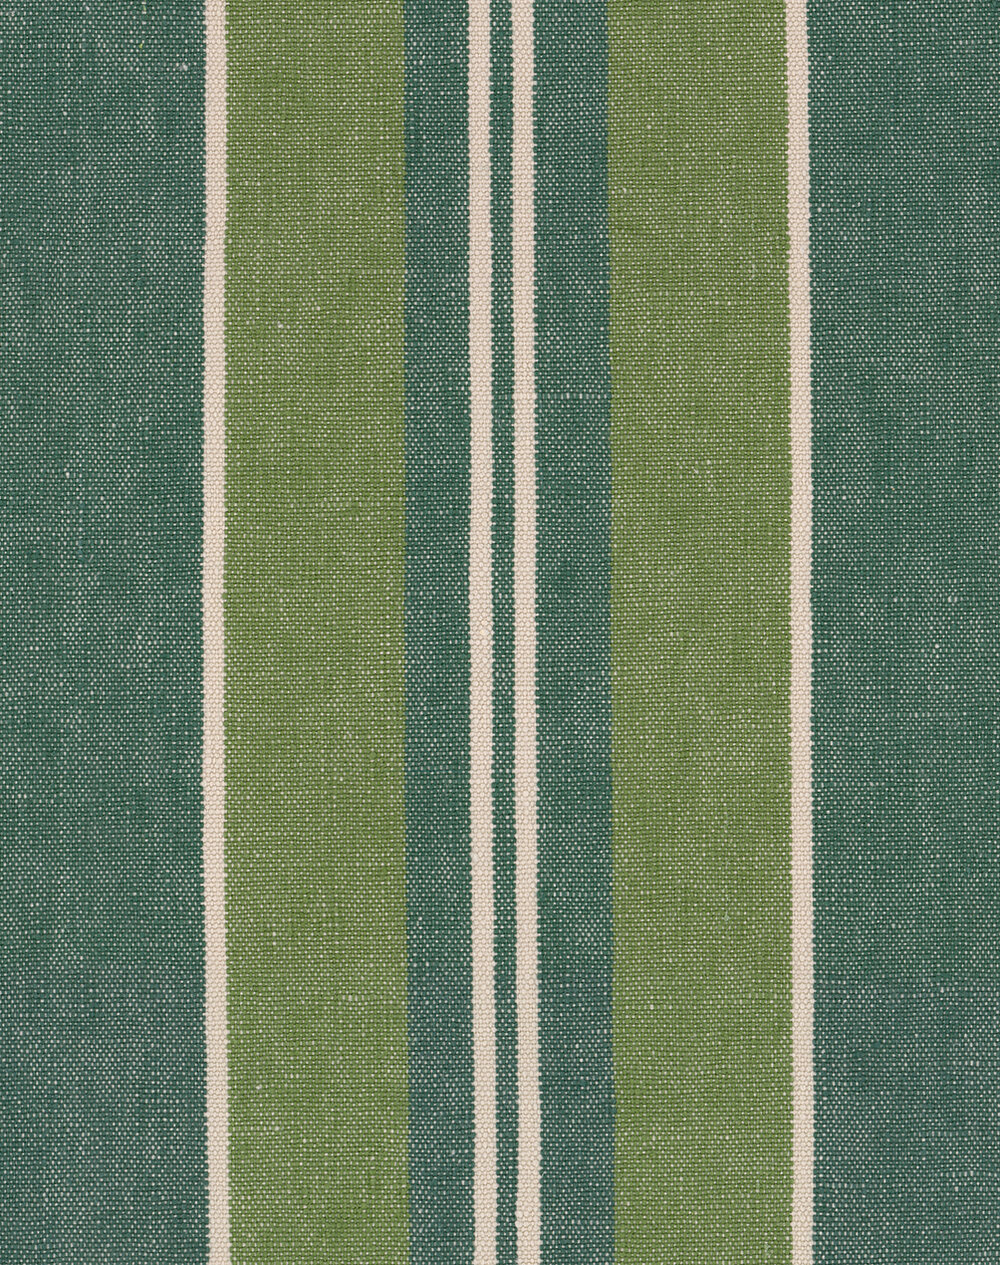 Szépviz Stripe Fabric - Green - by Mind the Gap